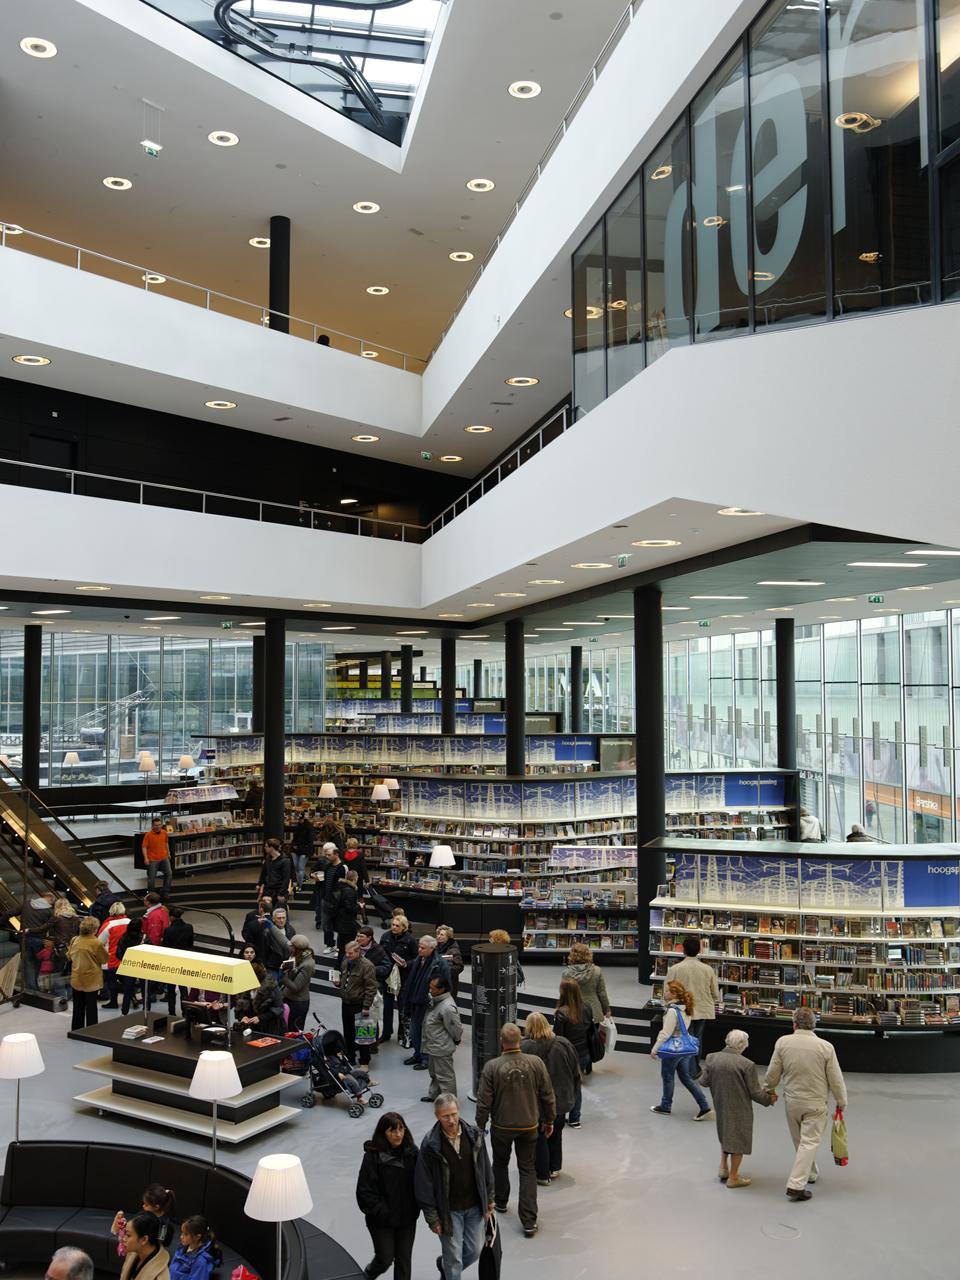 De nieuwe bibliotheek wikipedia - Idee bibliotheek ...